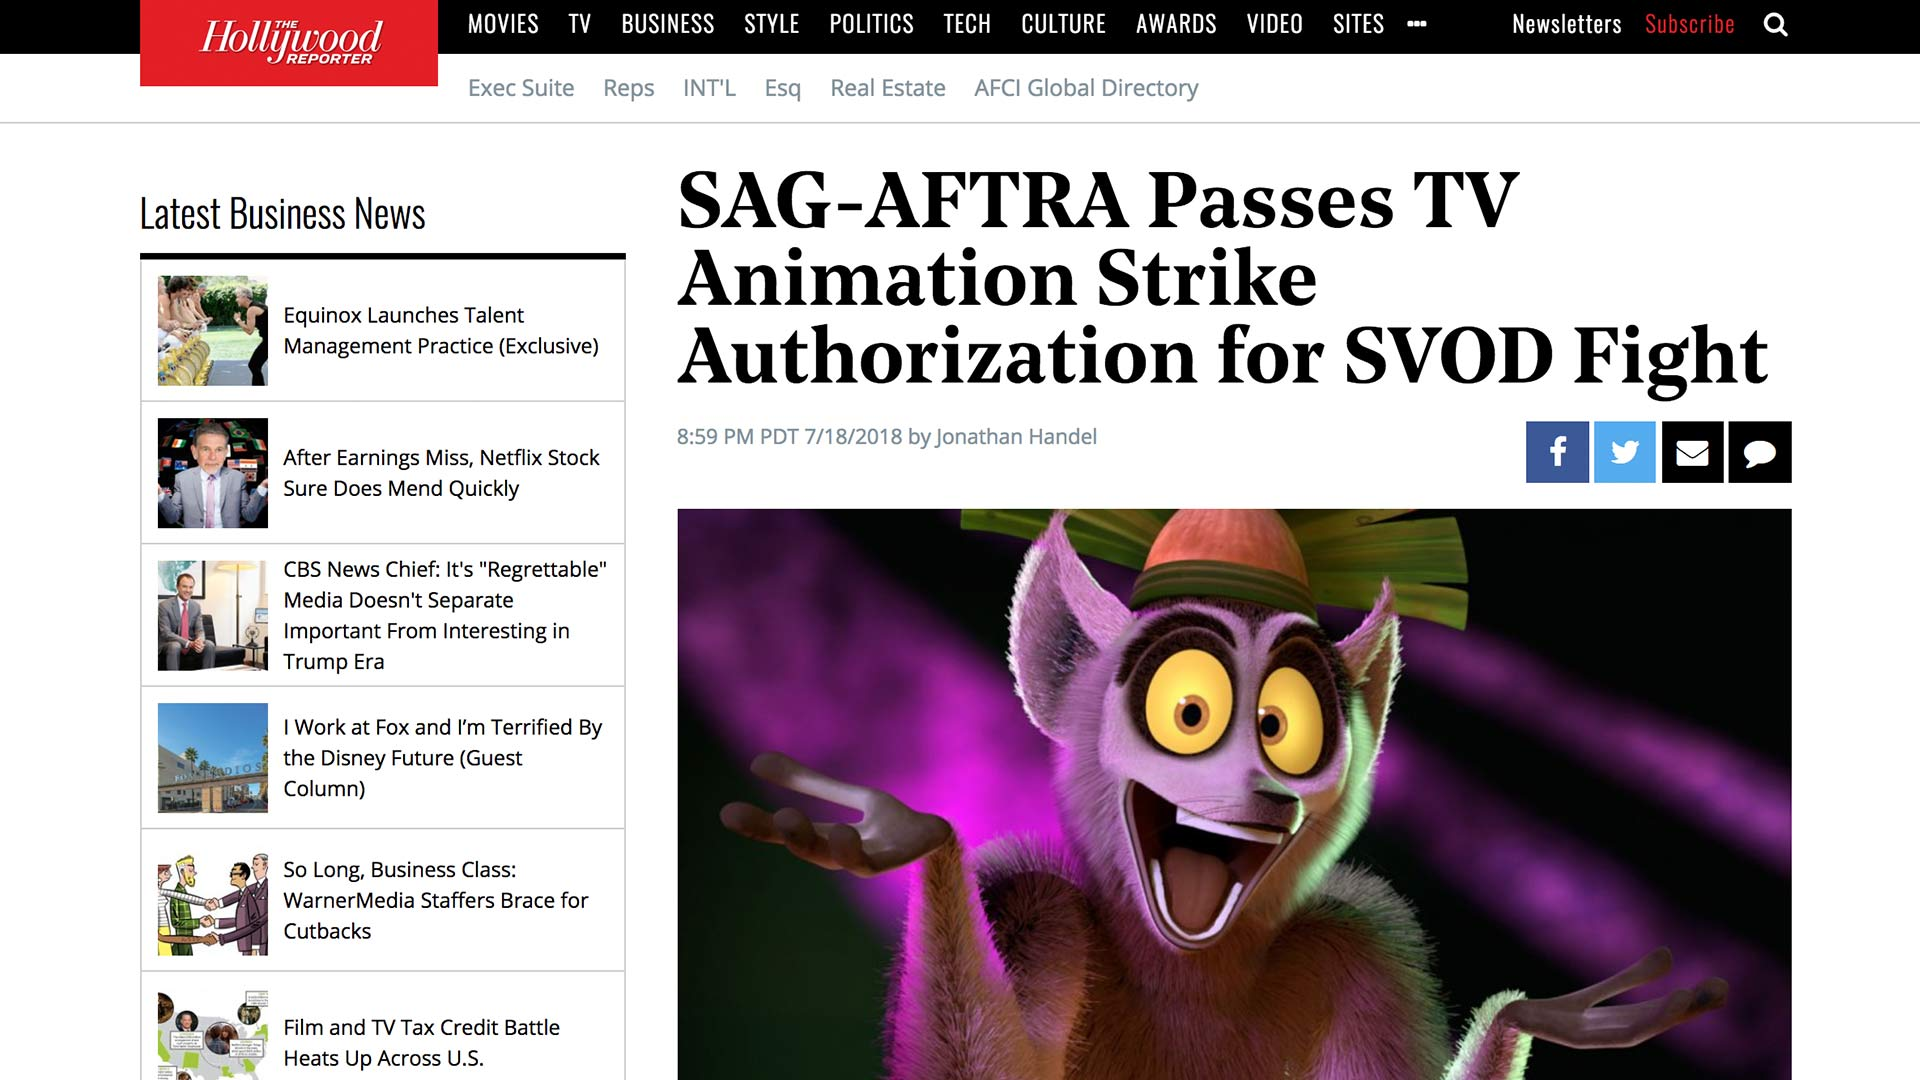 Fairness Rocks News SAG-AFTRA Passes TV Animation Strike Authorization for SVOD Fight